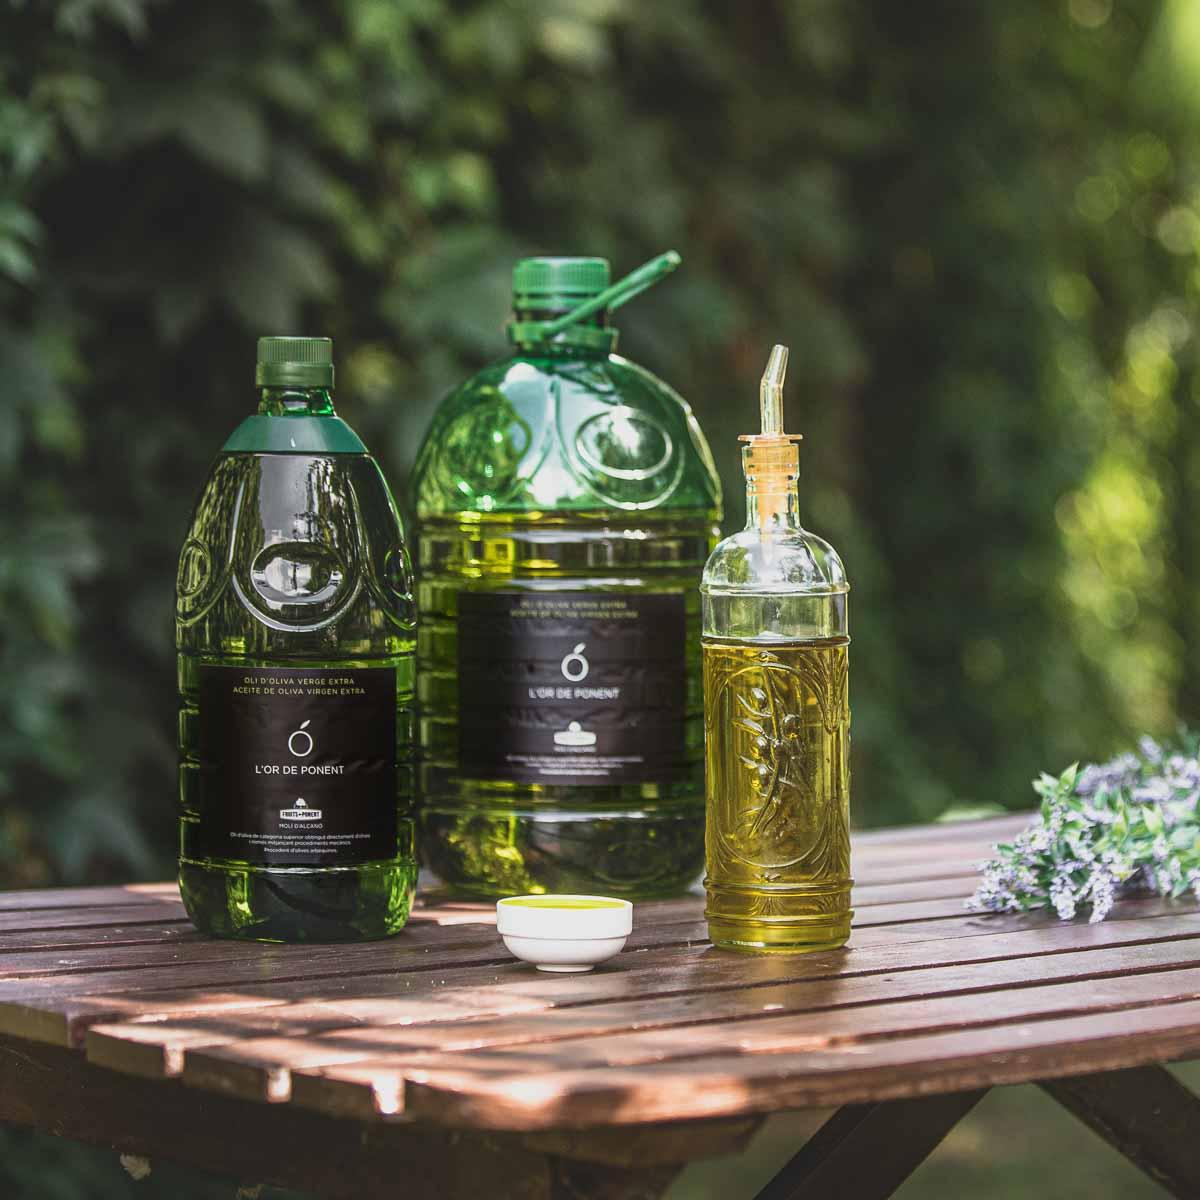 5 L-Or-de-Ponent-aove-aceite-oliva-virgen-extra-garrigues-denominacion-origen-3